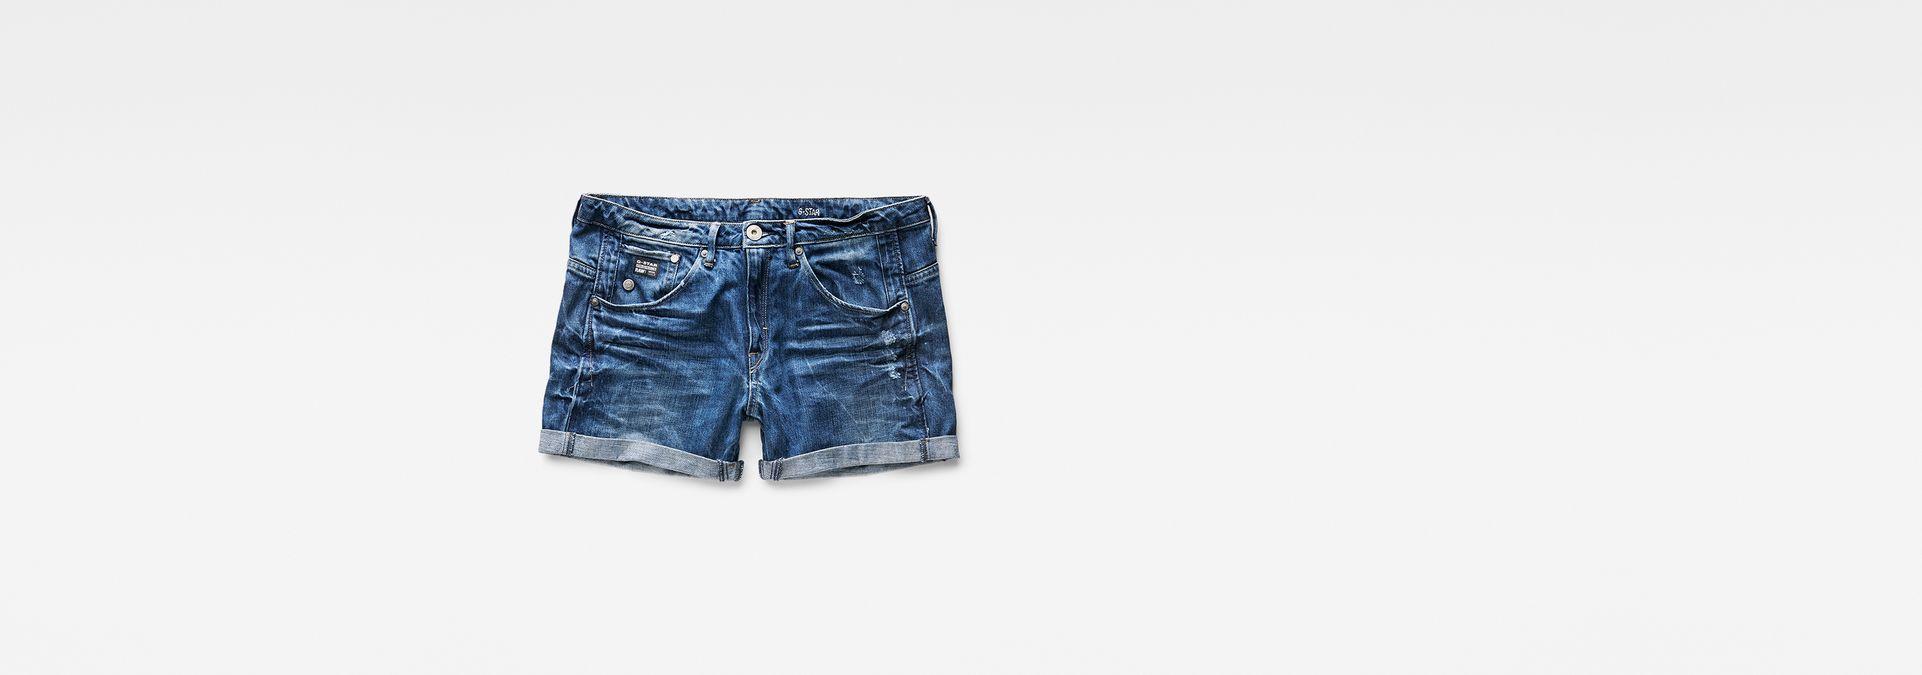 official photos 590c9 fe694 Arc 3D Shorts | Medium Aged Destroy | Women | G-Star RAW®